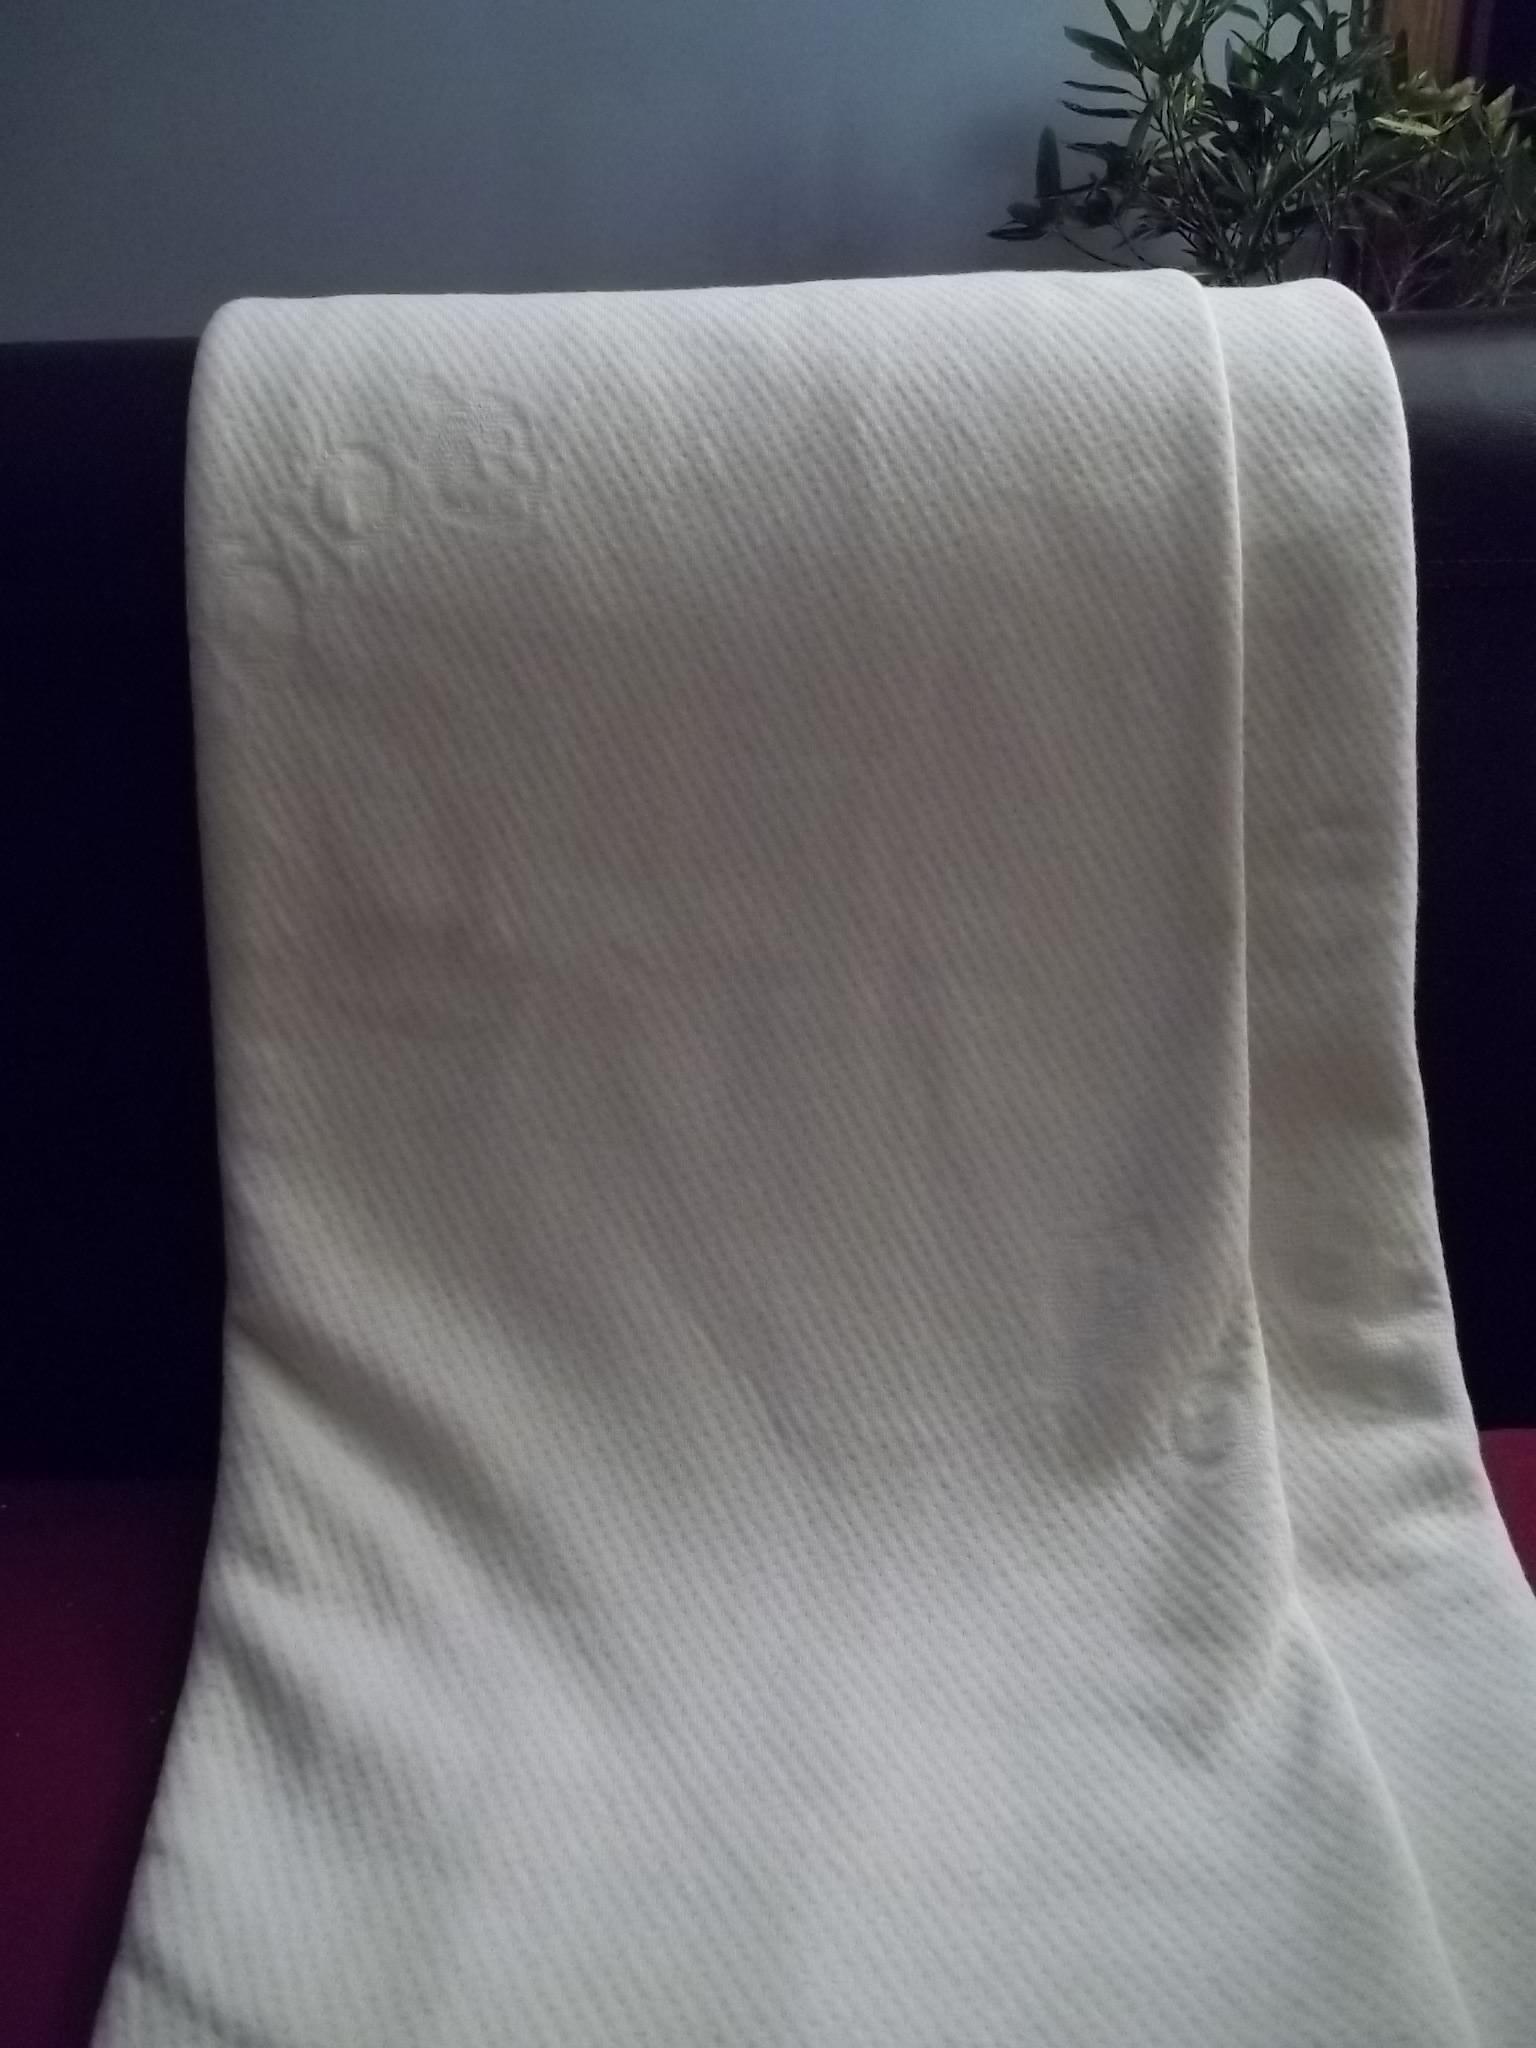 c06106c8c2b Double Knit GOTS Organic Cotton Fabric Draped